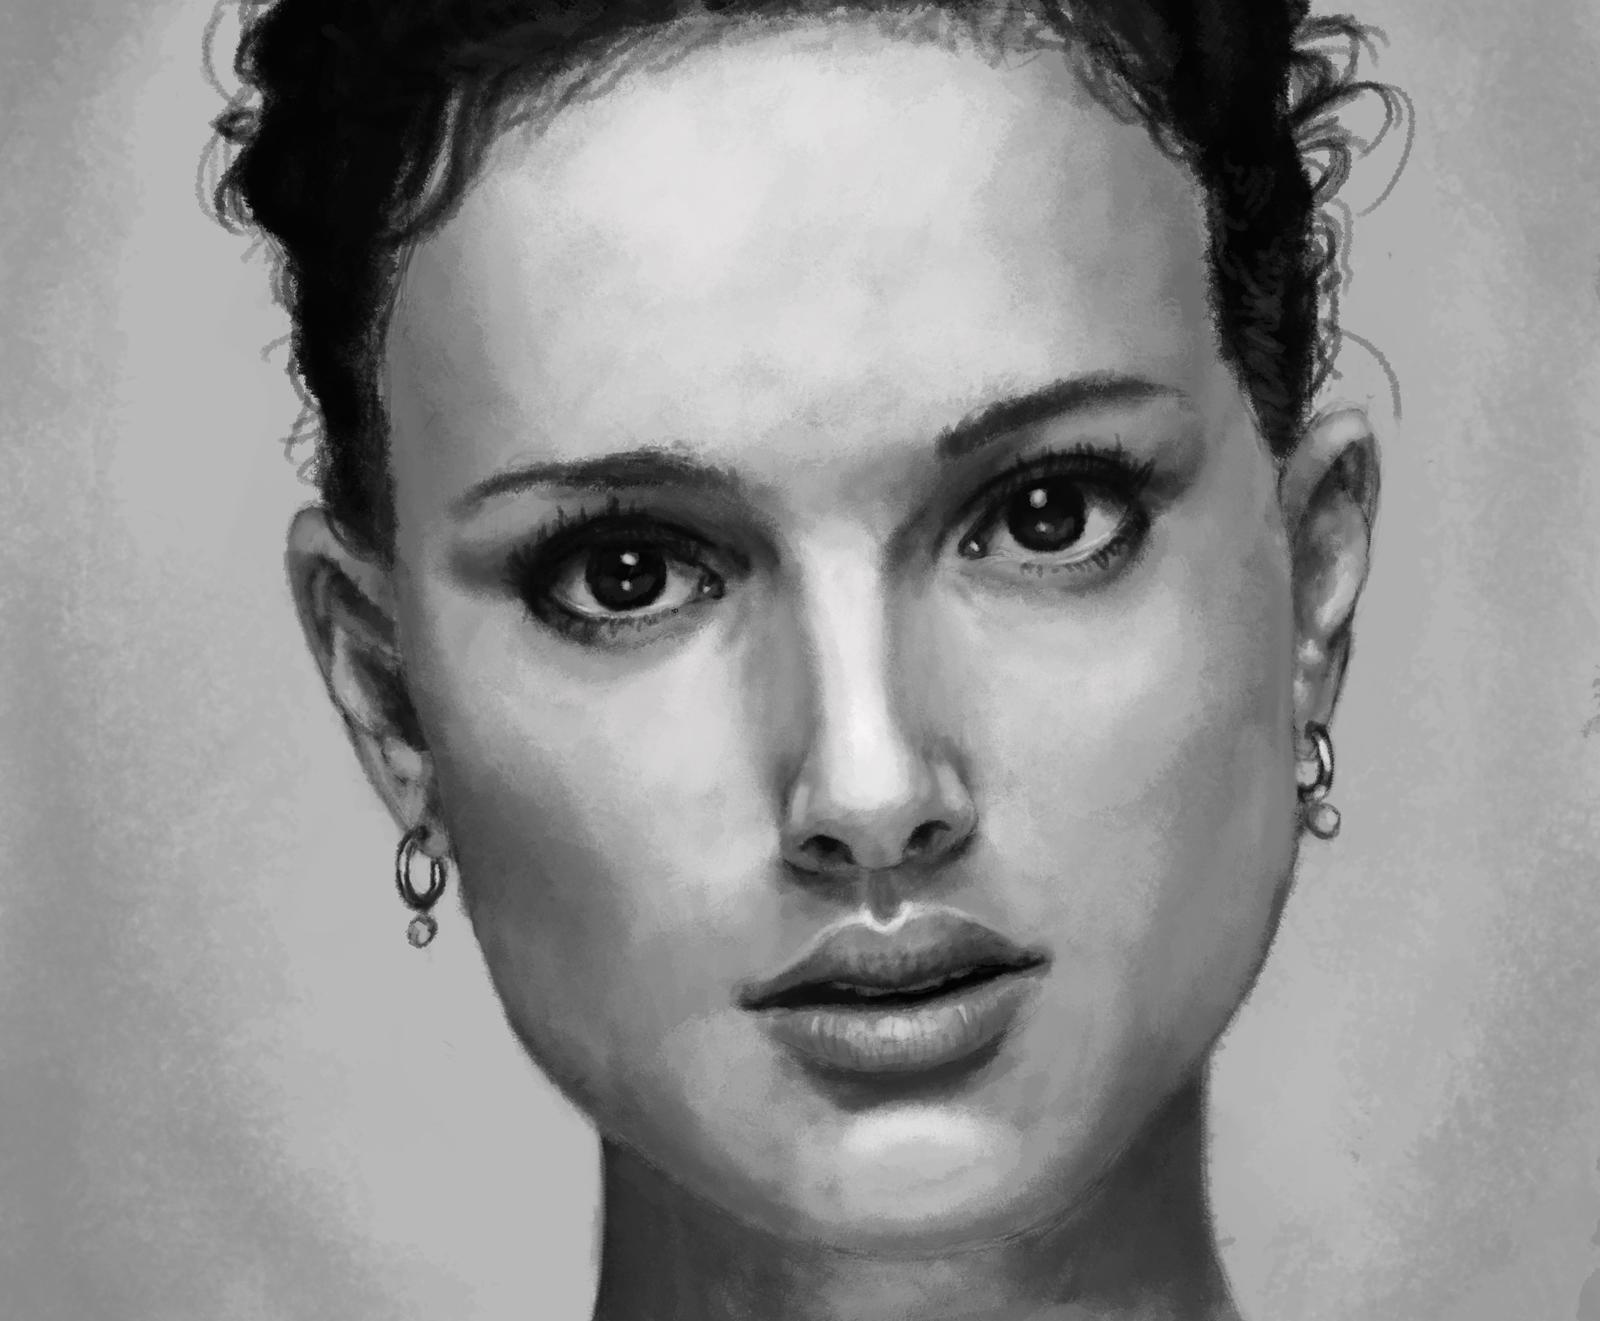 Natalie Portman Grayscale